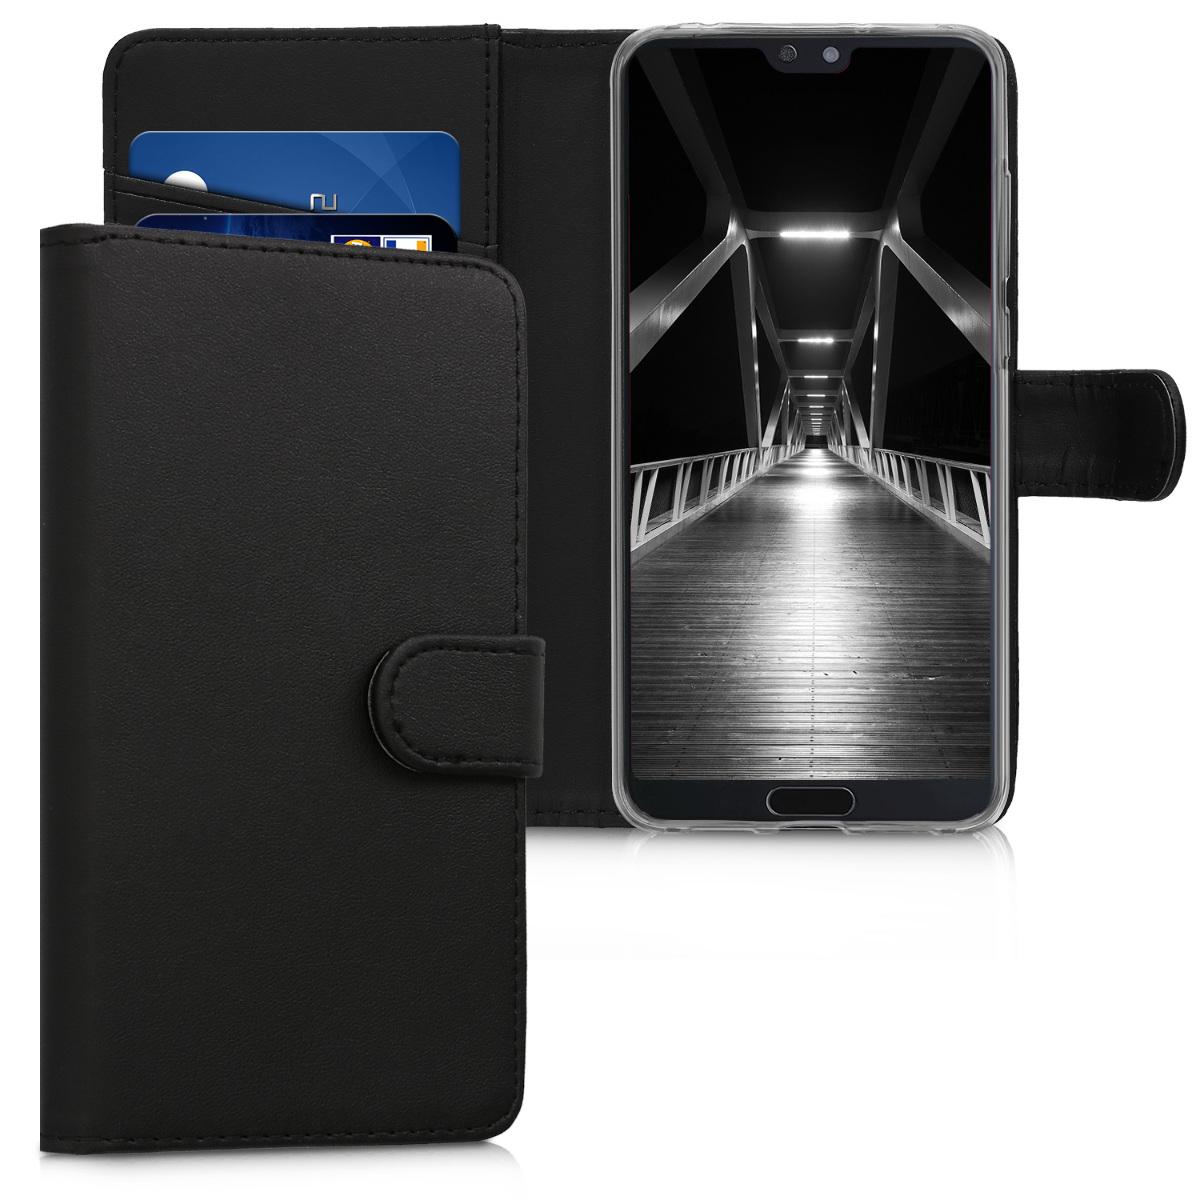 KW Θήκη Πορτοφόλι Huawei P20 Pro - Συνθετικό Δέρμα - Black (45926.01)